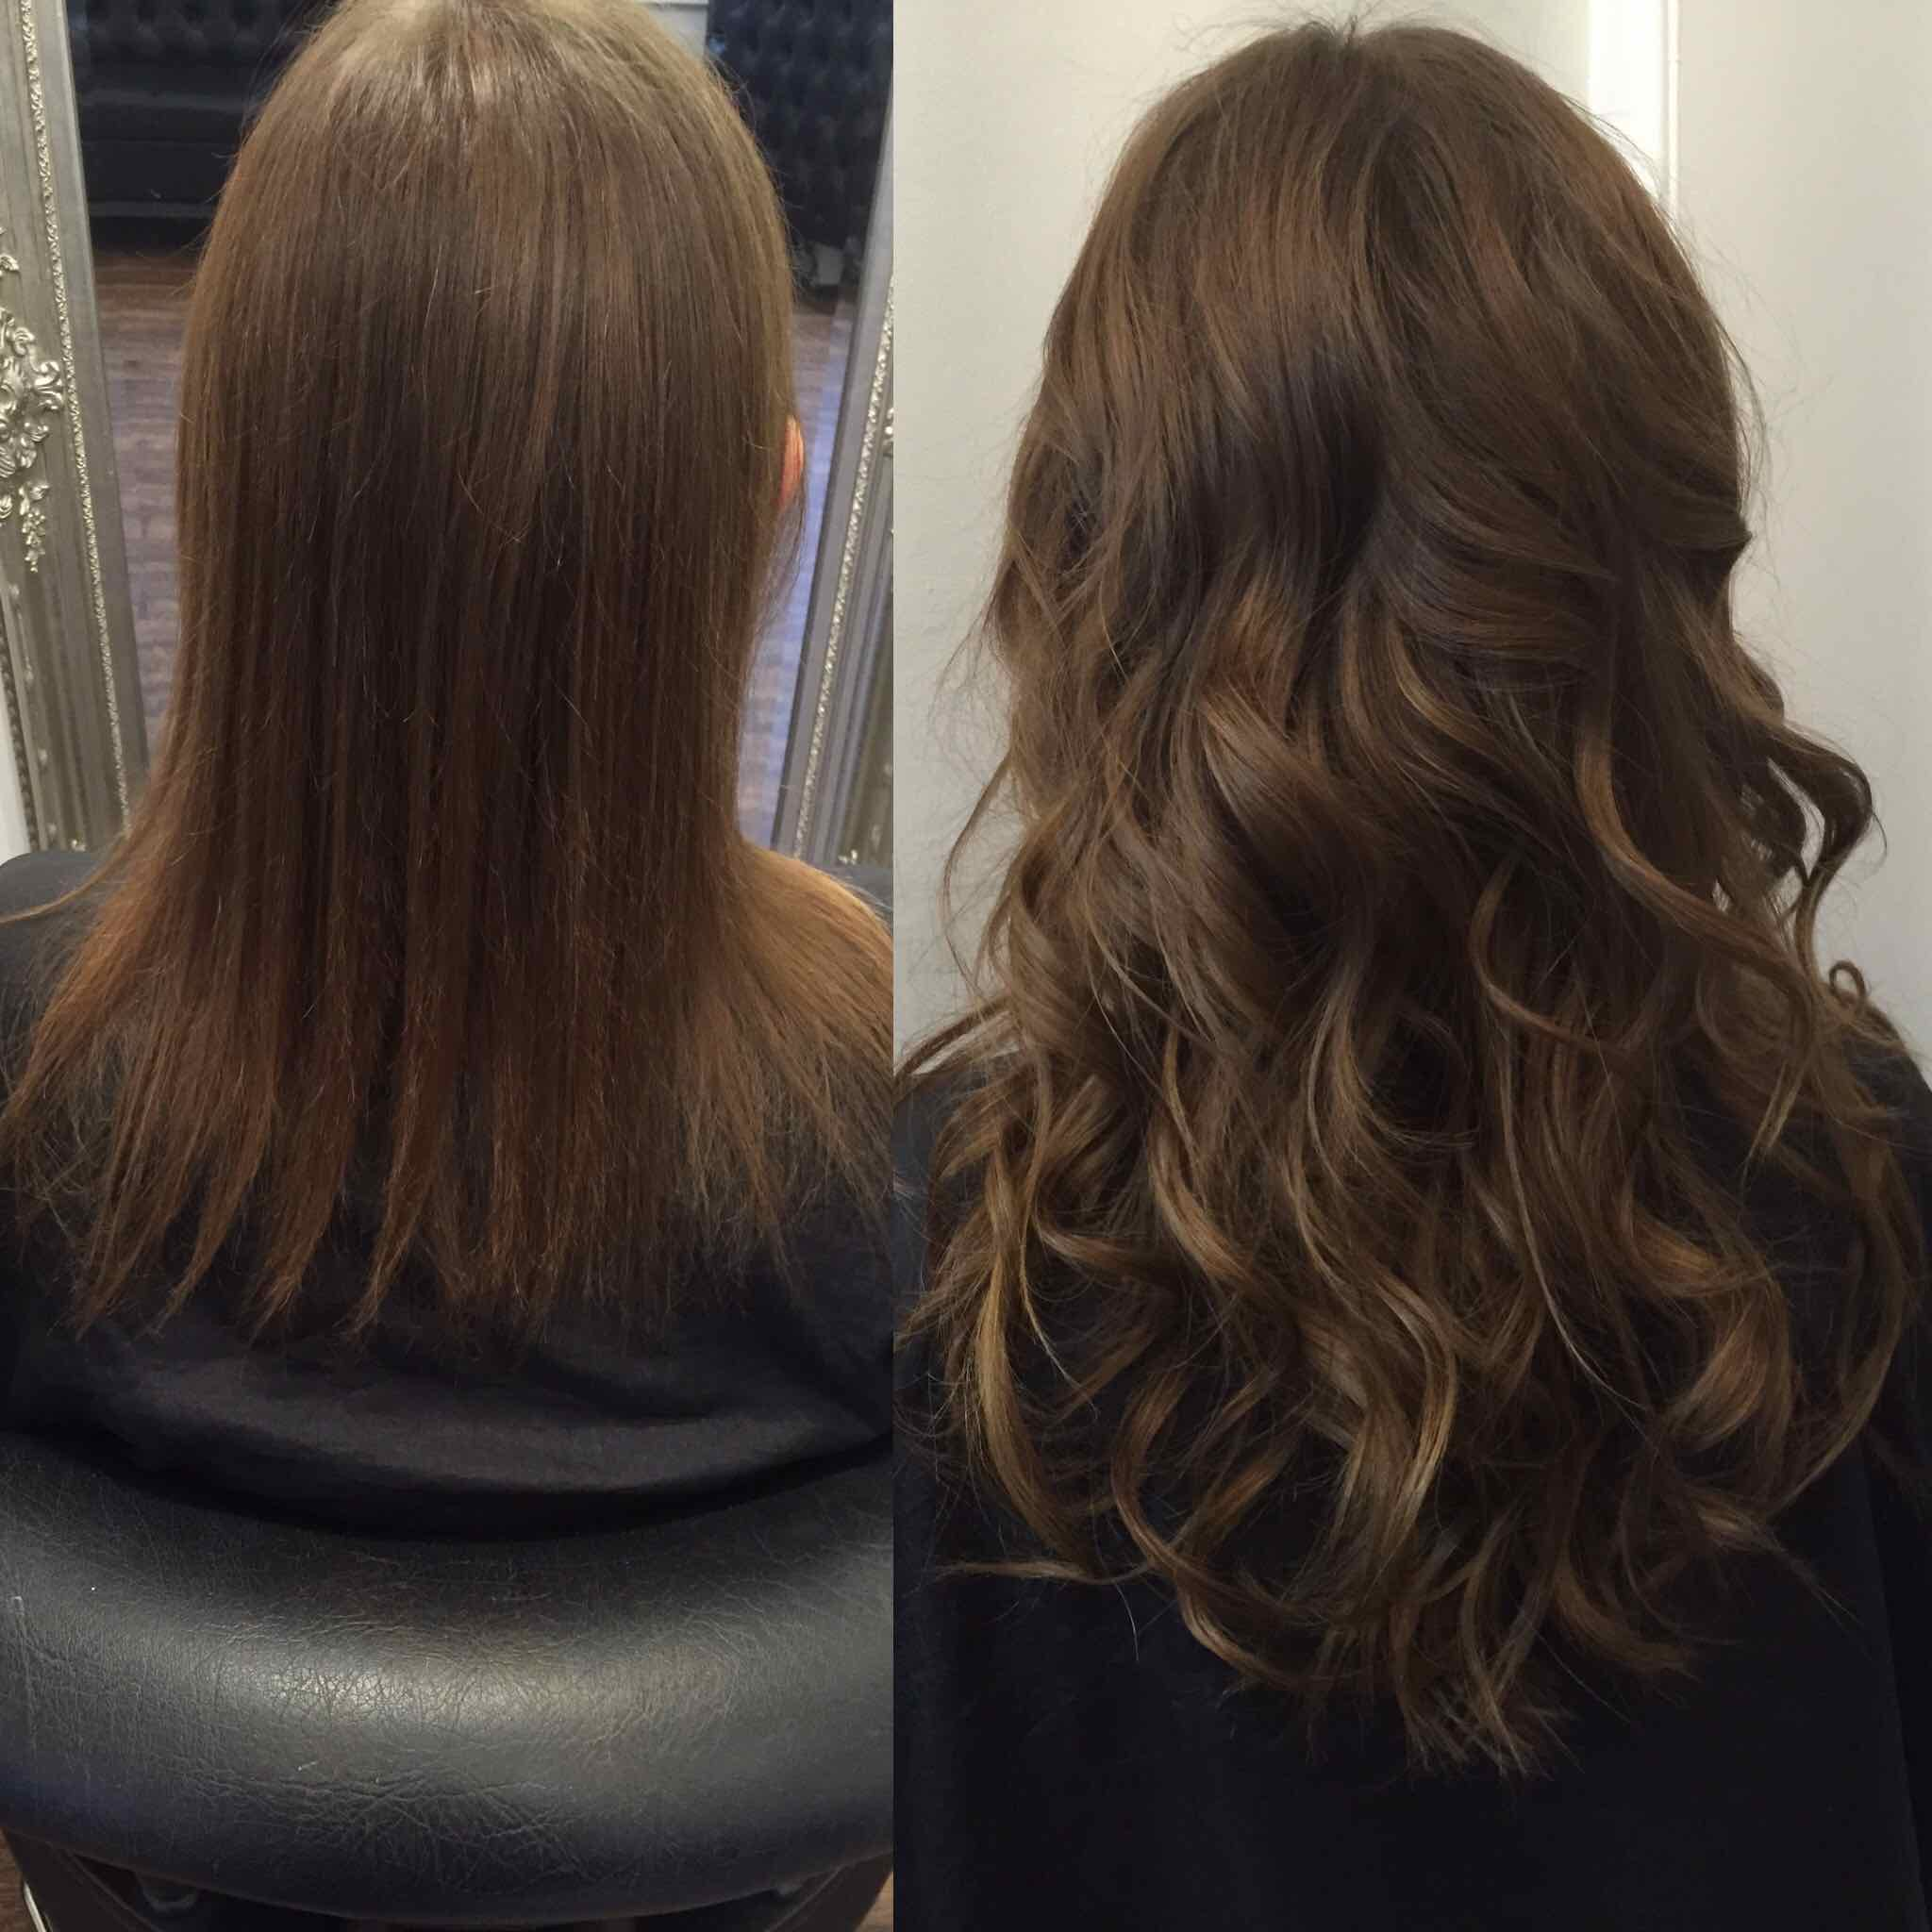 Balmain Hair Extension Offer At Our Highworth Hair Salon In Swindon